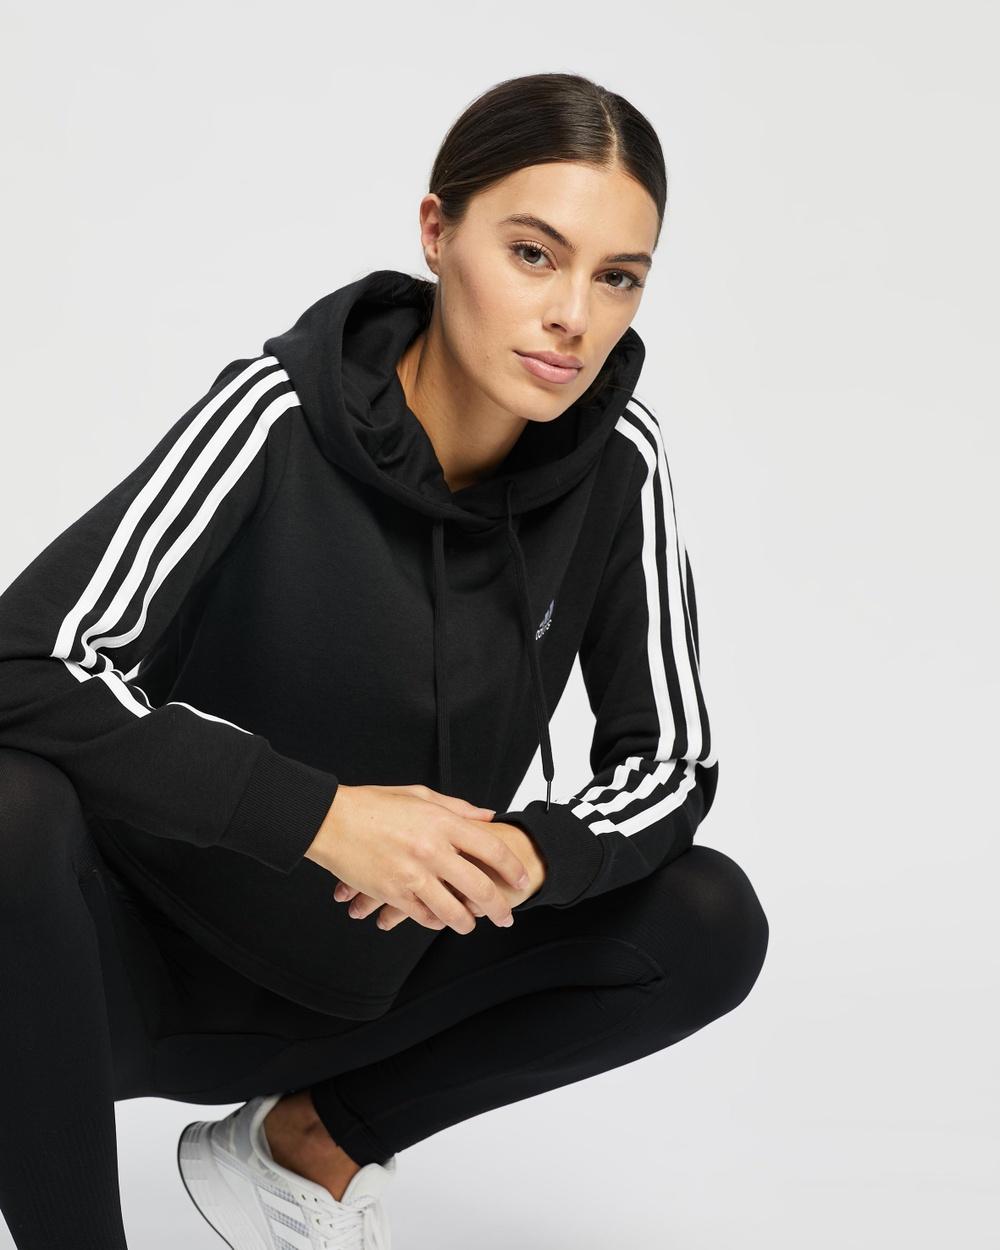 adidas Performance Essentials 3 Stripes Cropped Hoodie Hoodies Black & White 3-Stripes